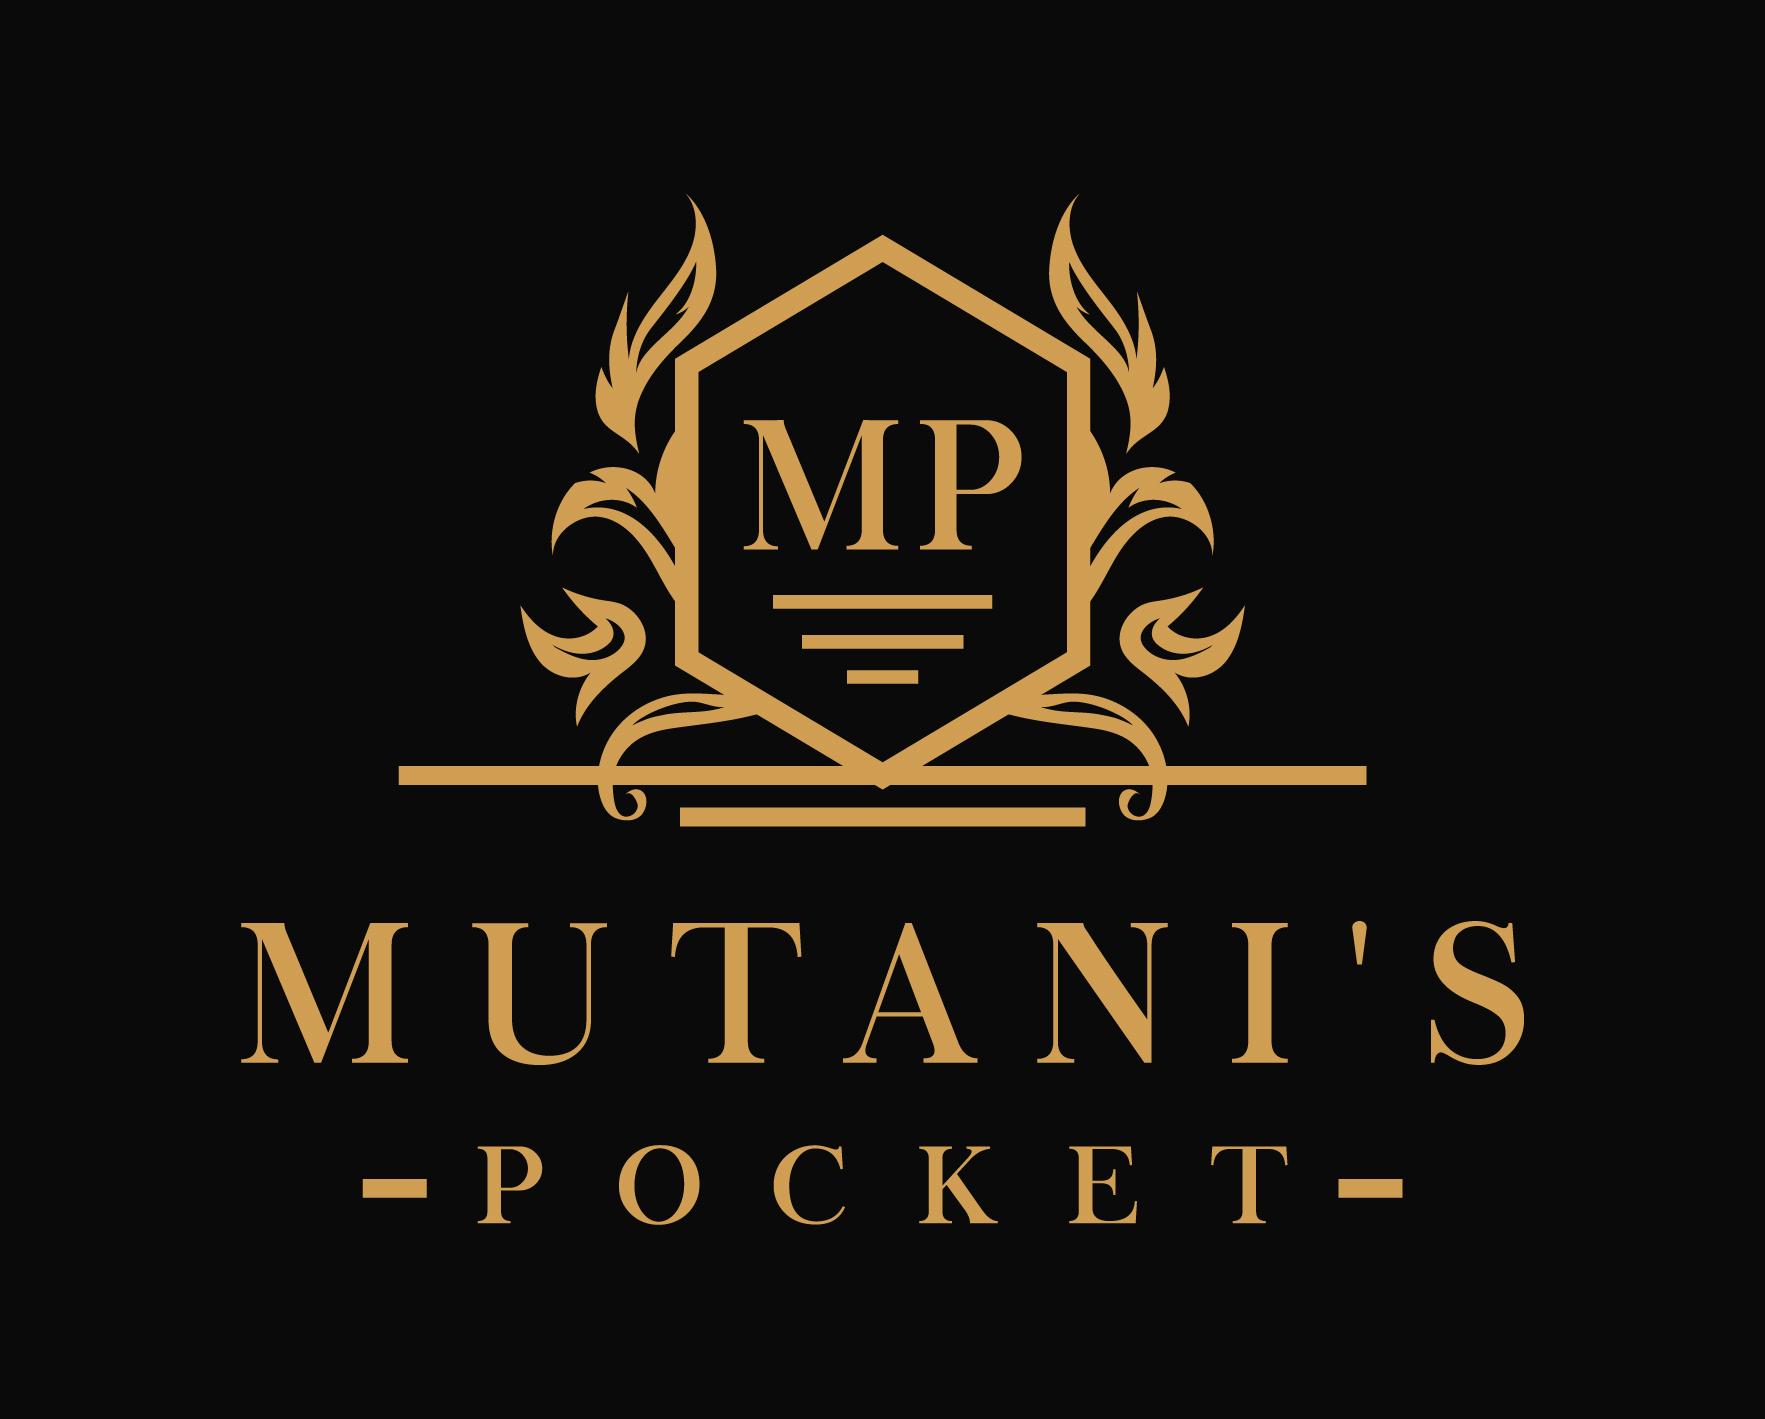 Mutani's Pocket